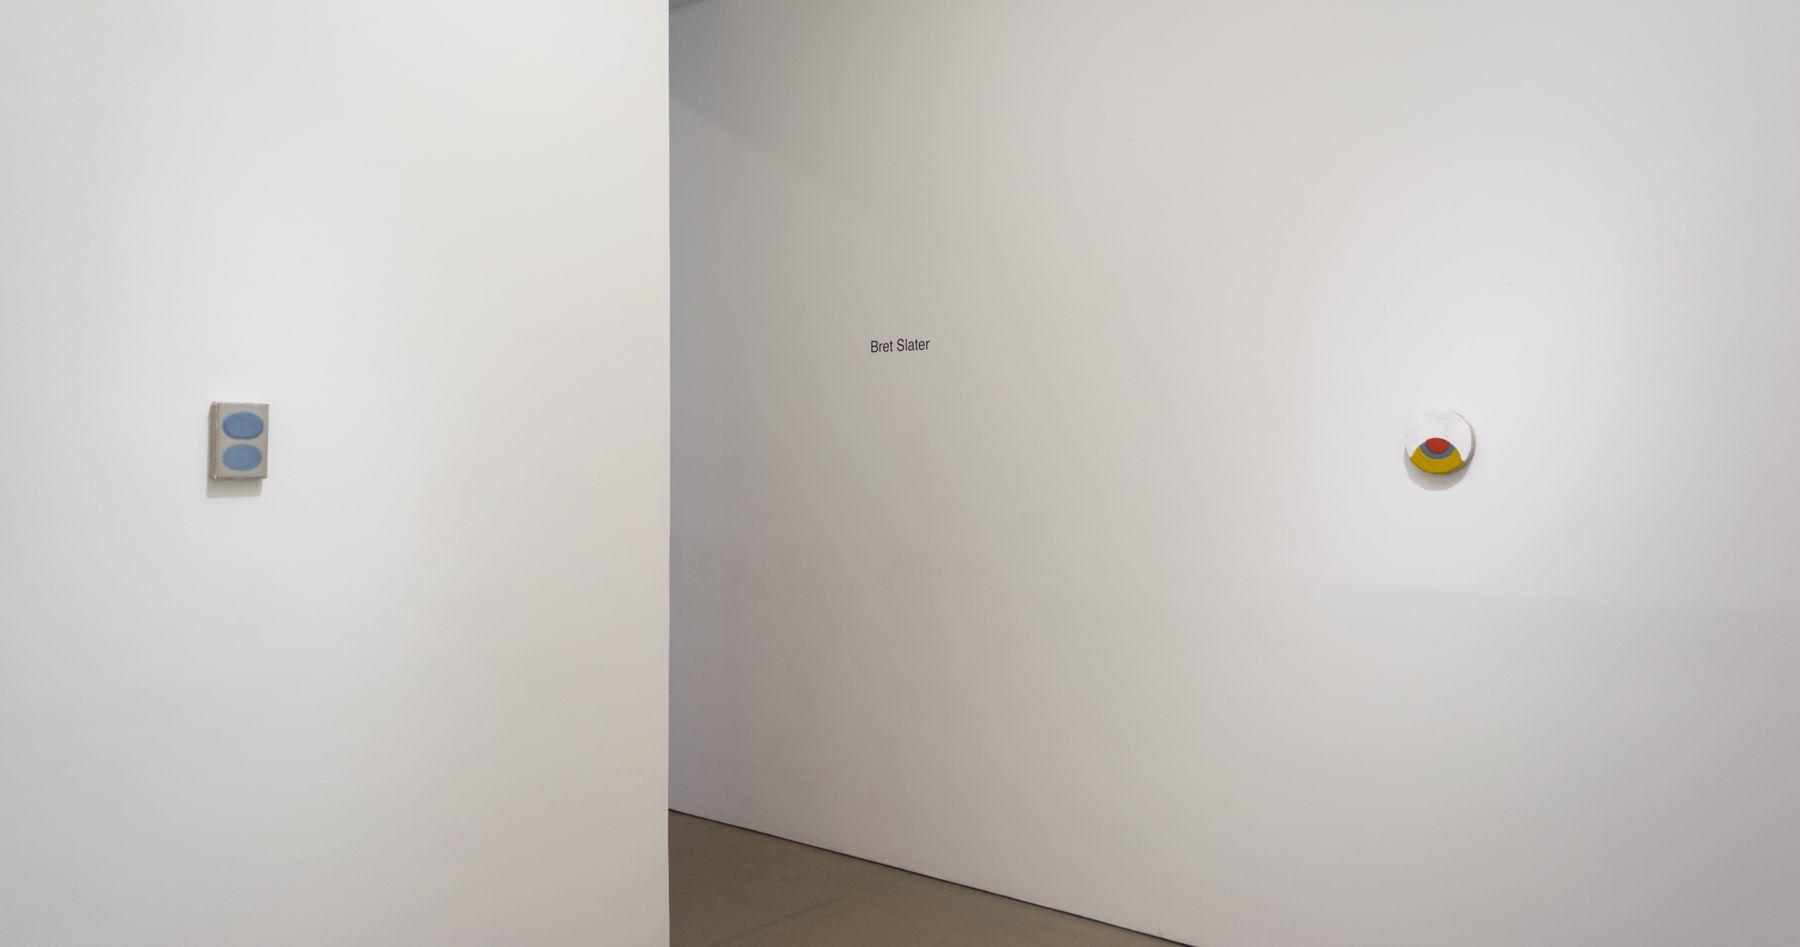 Bret Slater, (installation view)